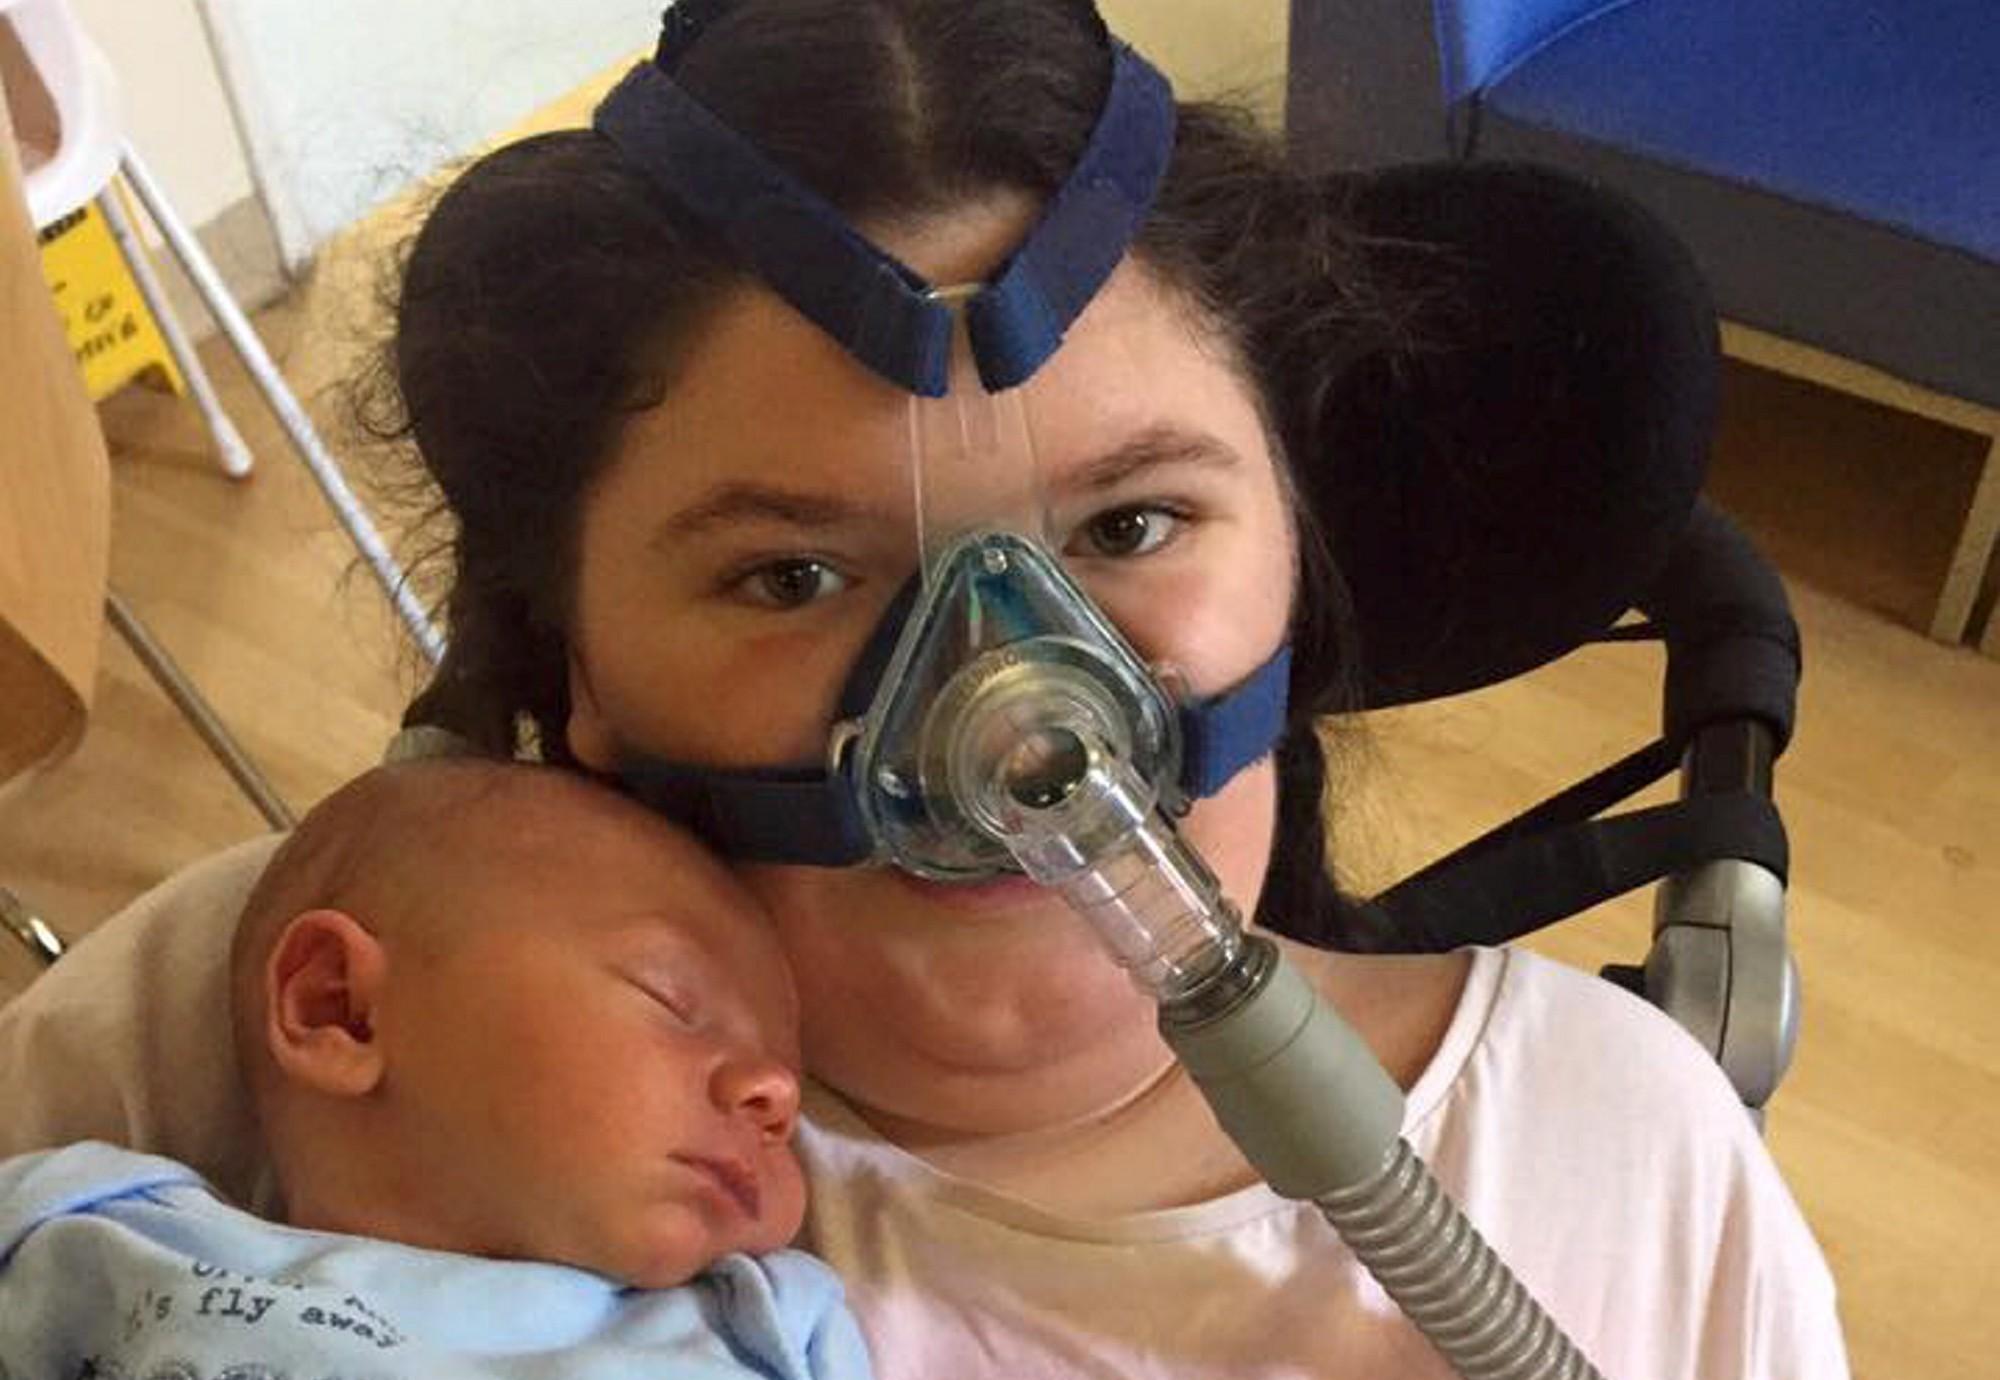 Elysha with her nephew, baby Elijah.